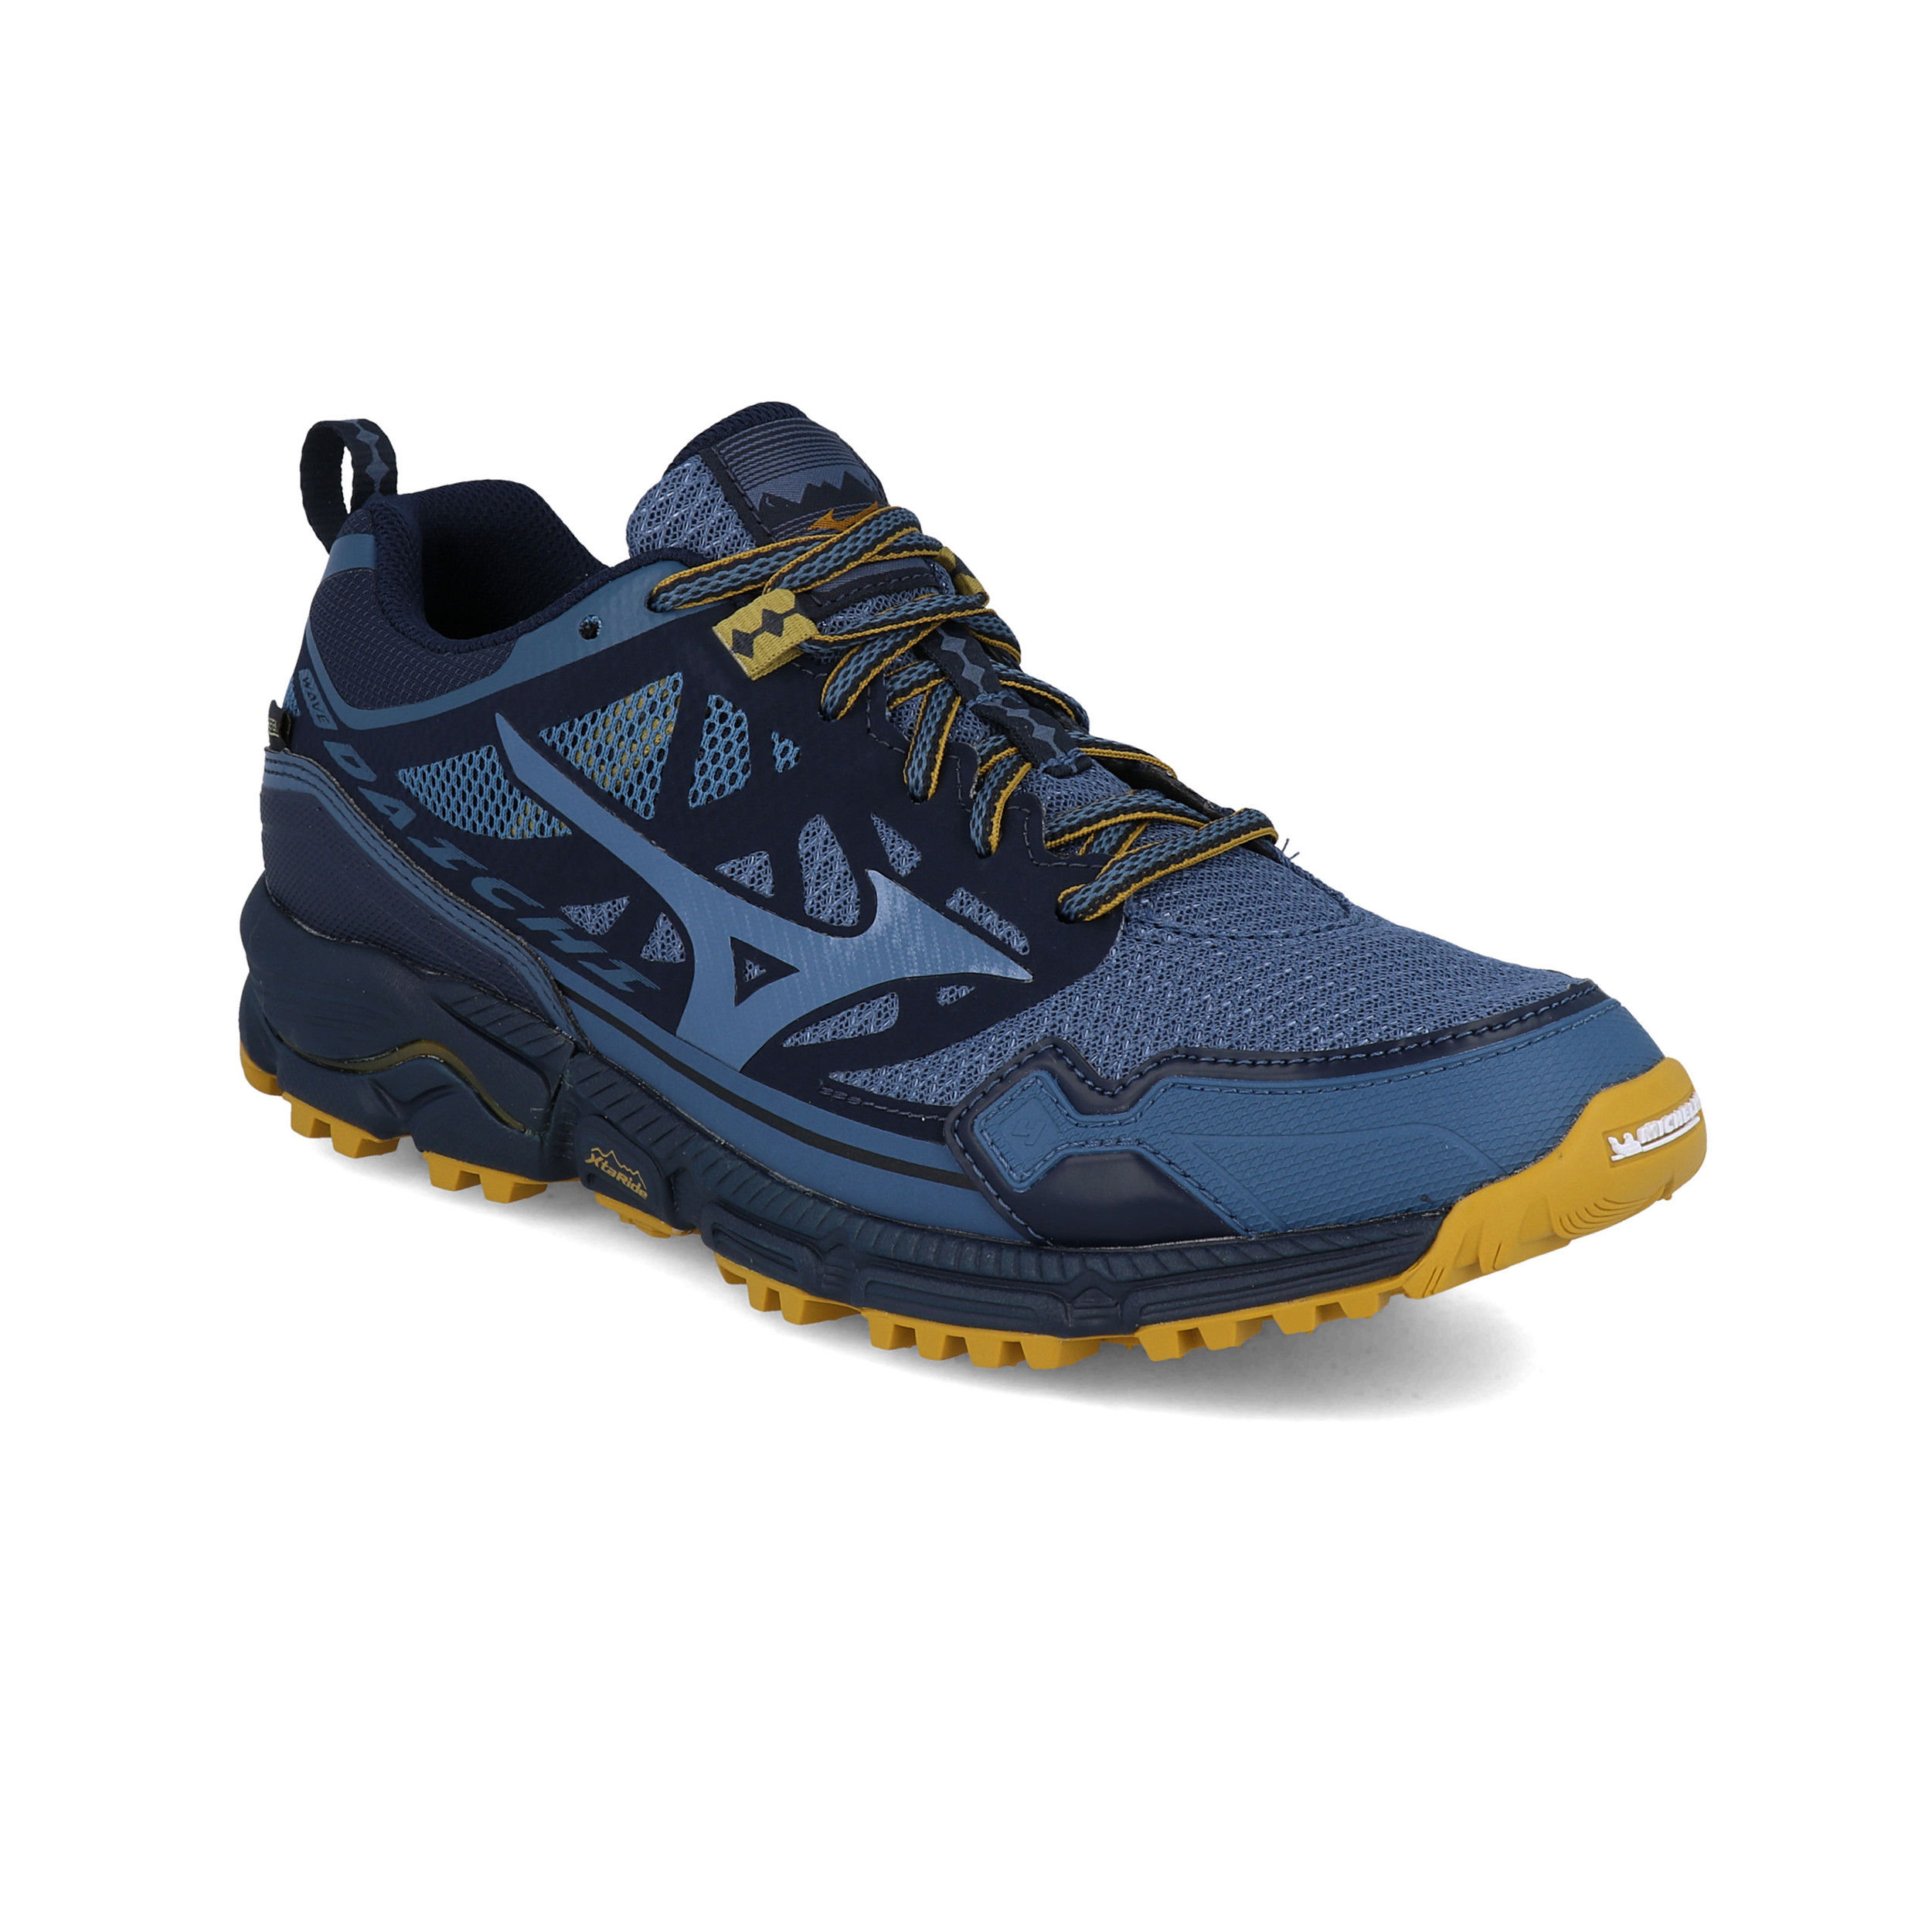 Mizuno Mens Wave Daichi 4 GORE-TEX Trail Running Shoes Trainers Sneakers